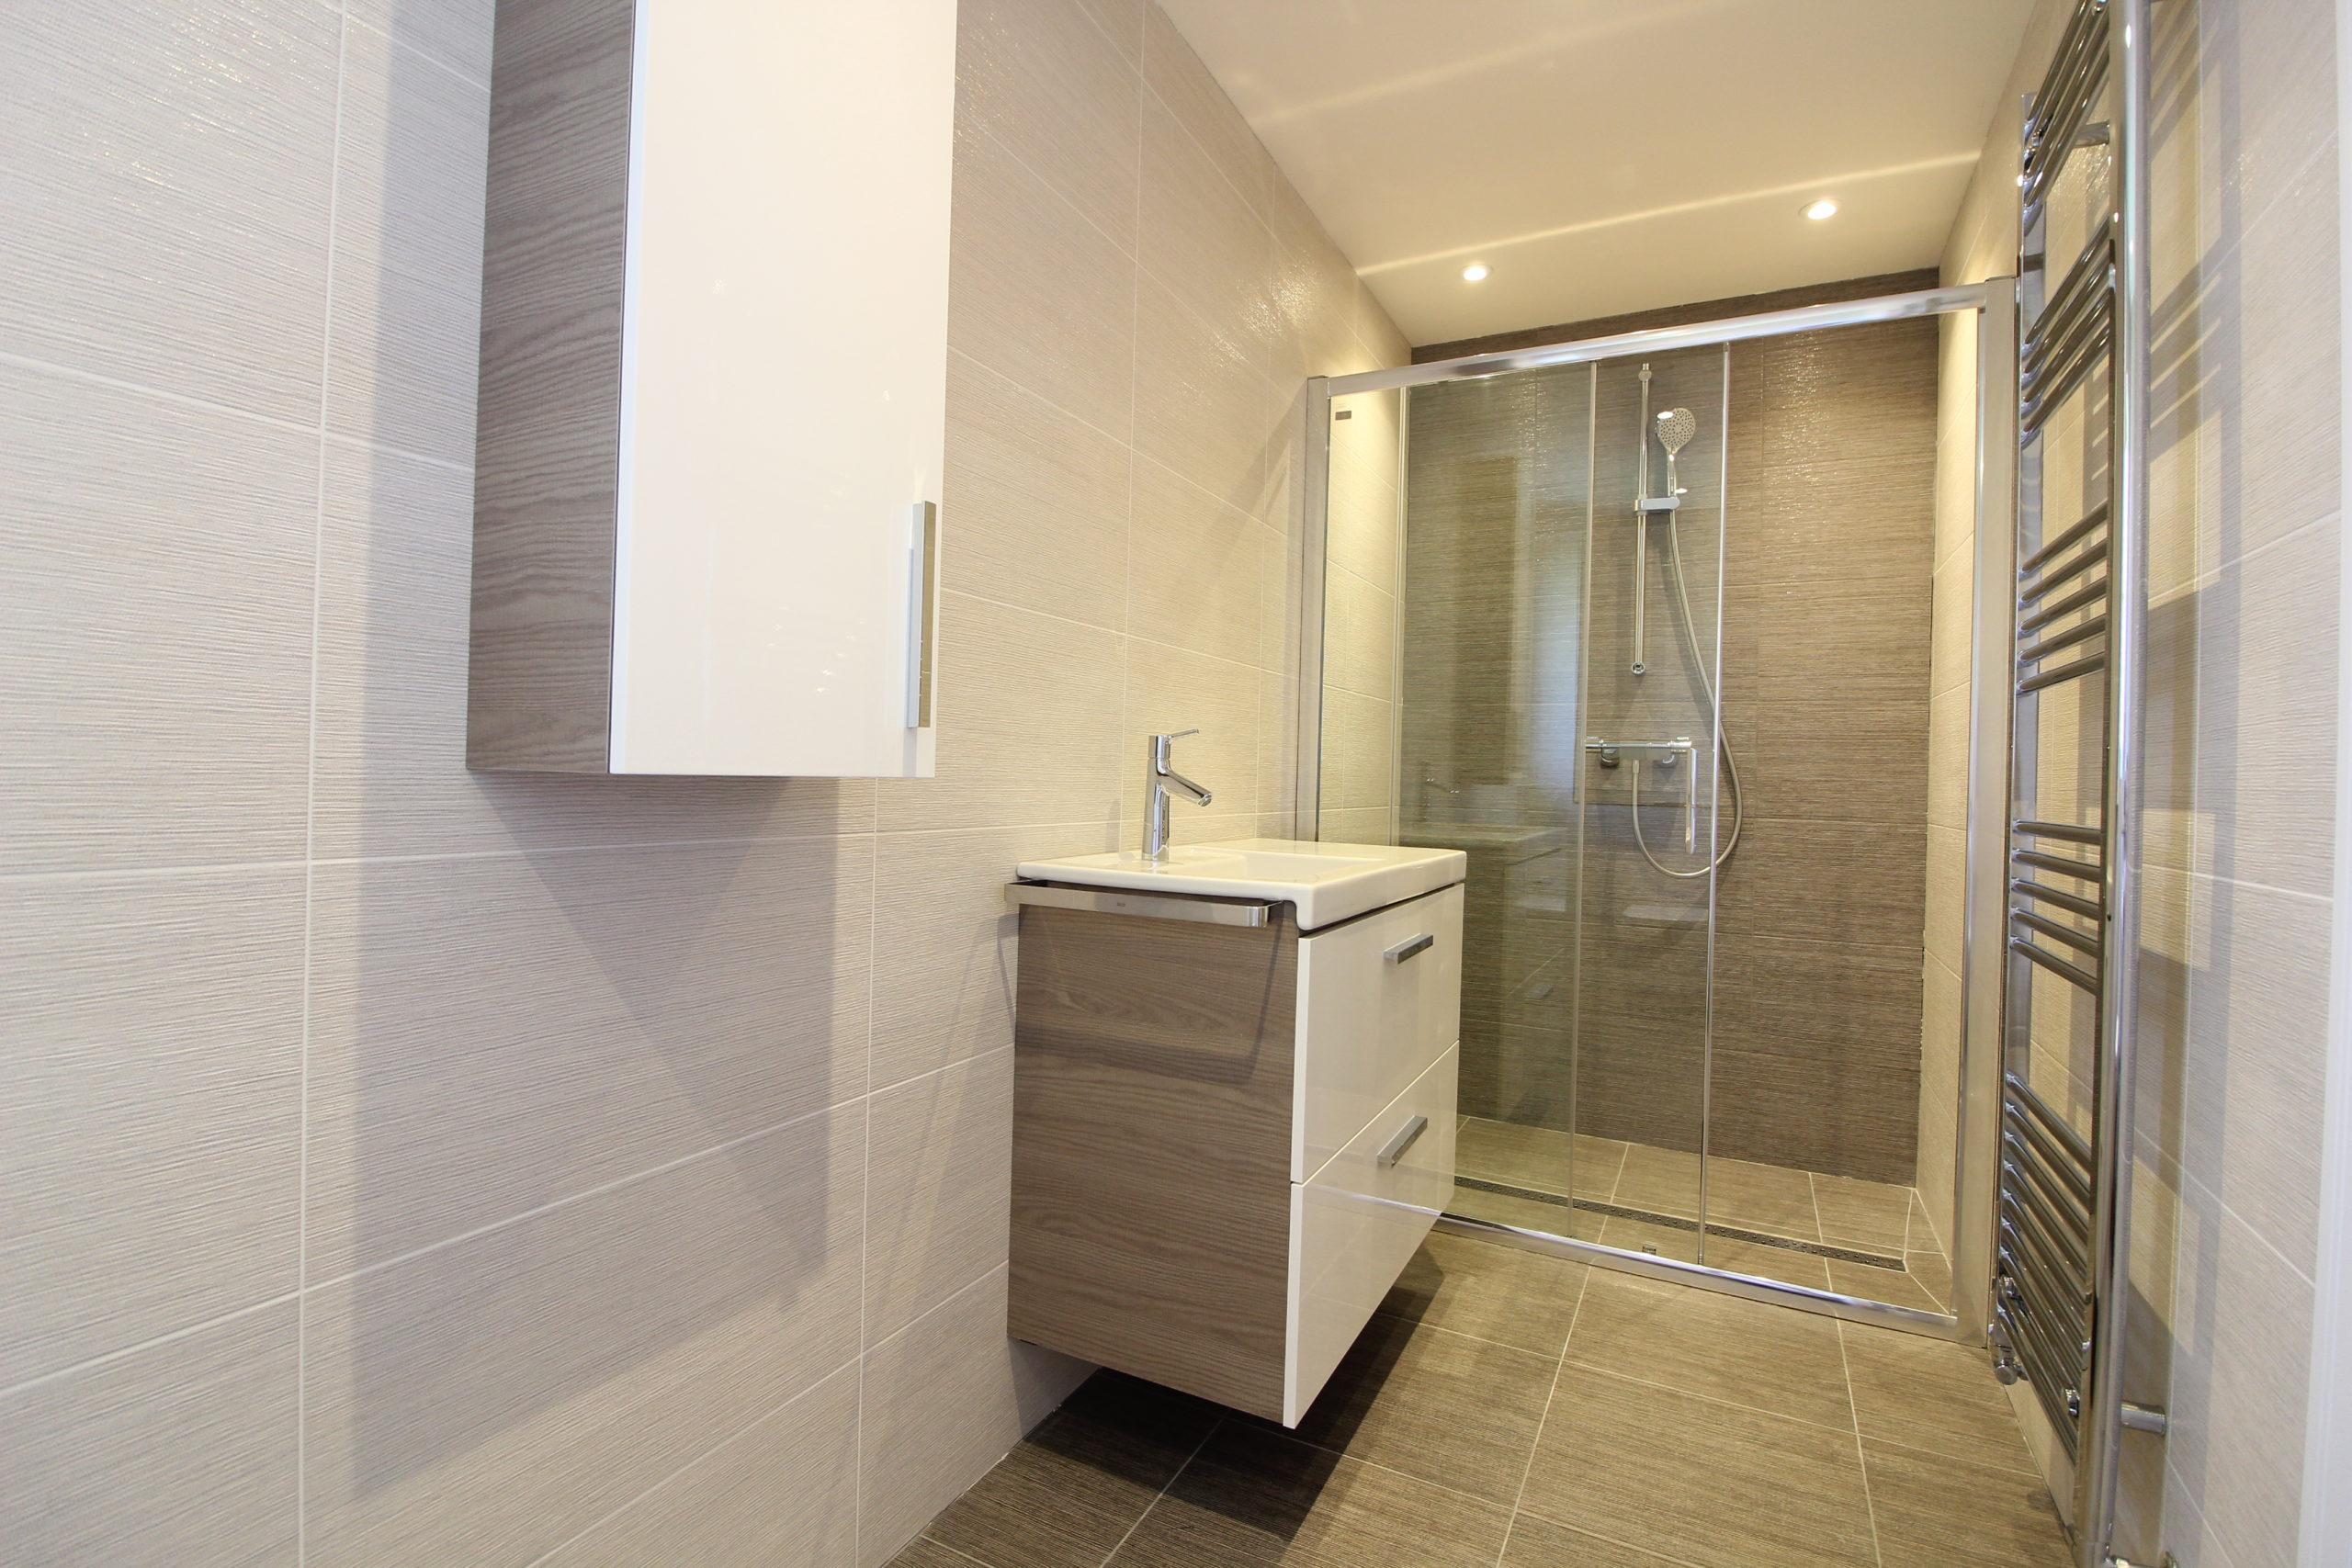 Modern tiled clarendon bathroom